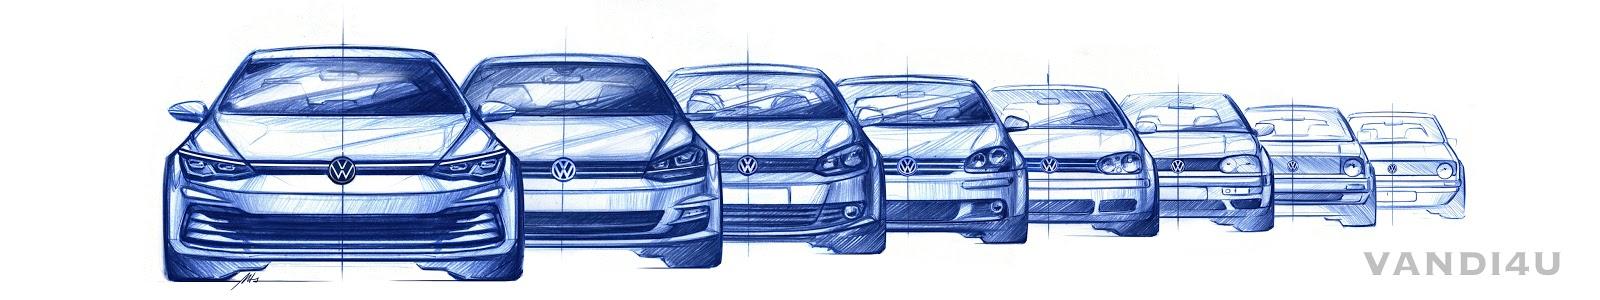 2020 Volkswagen Golf design revealed   VANDI4U